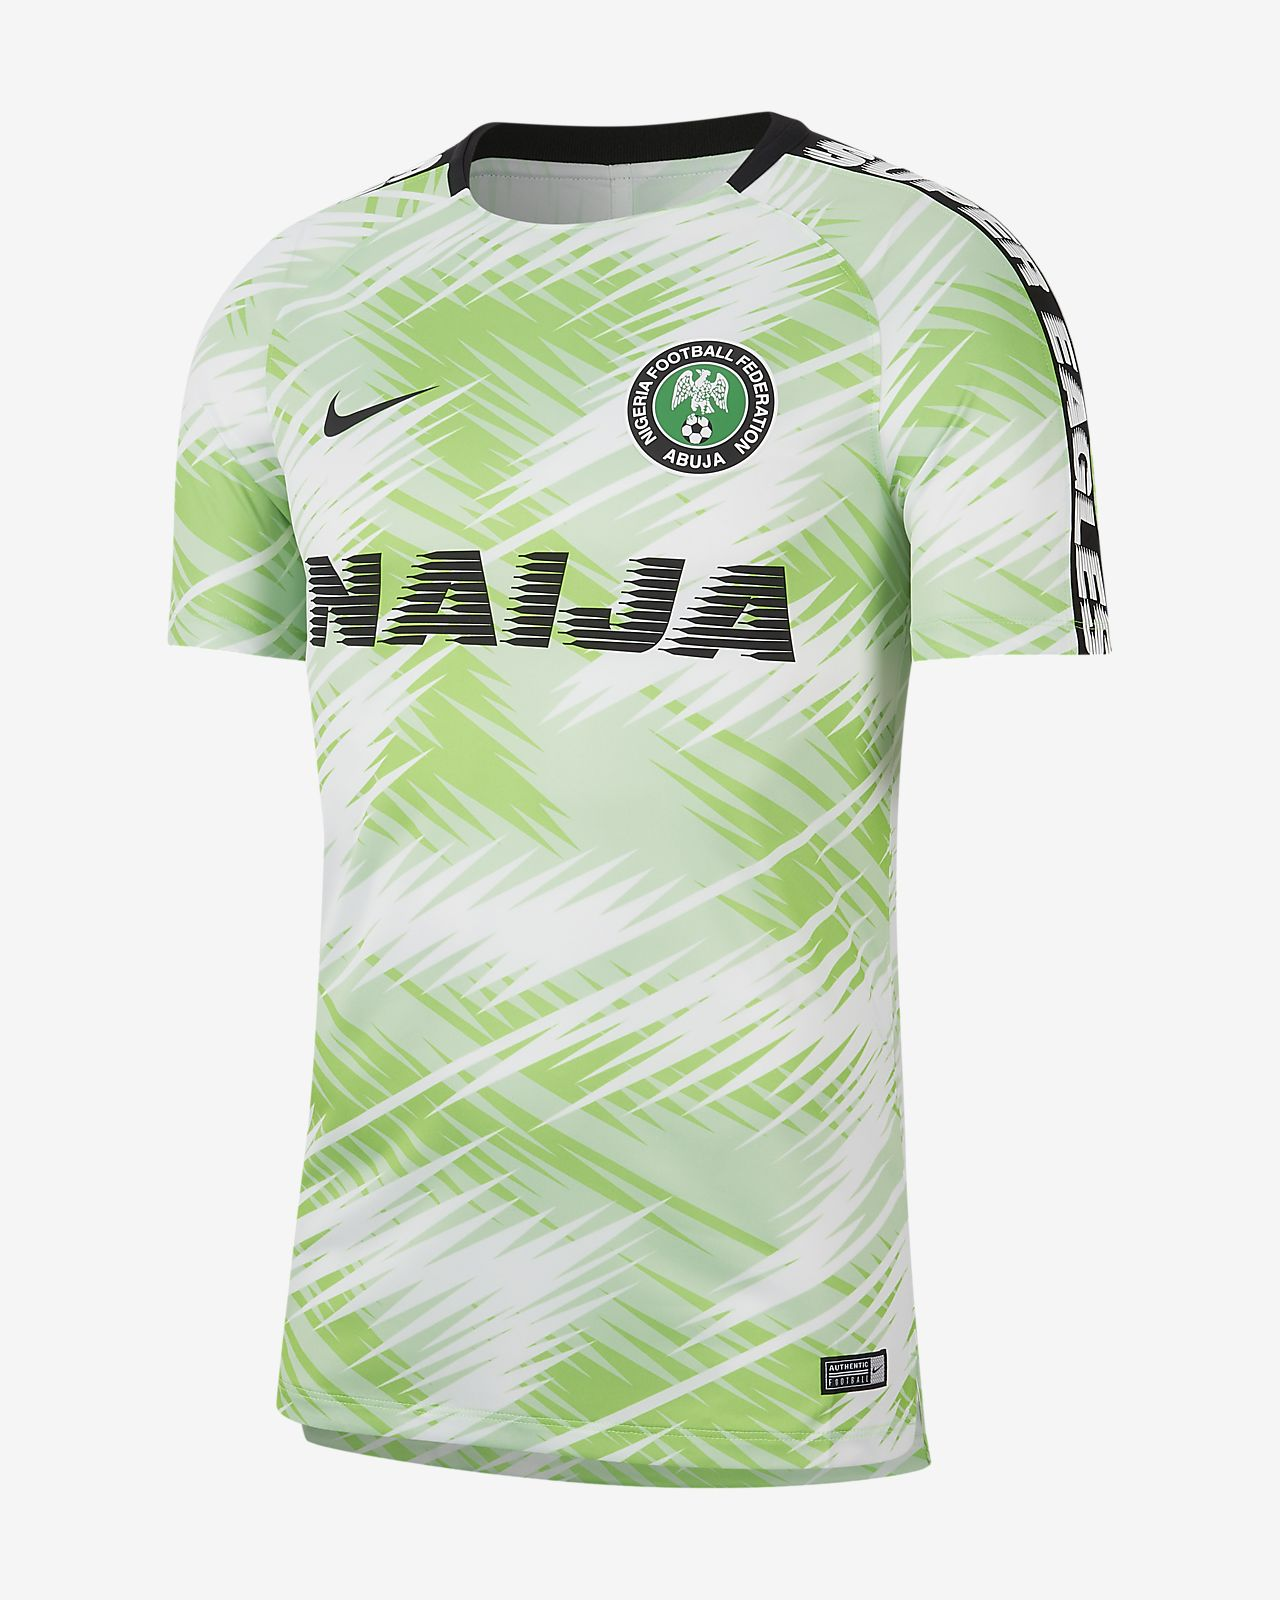 wholesale dealer db176 2bbb6 Nigeria Squad Men's Football Top